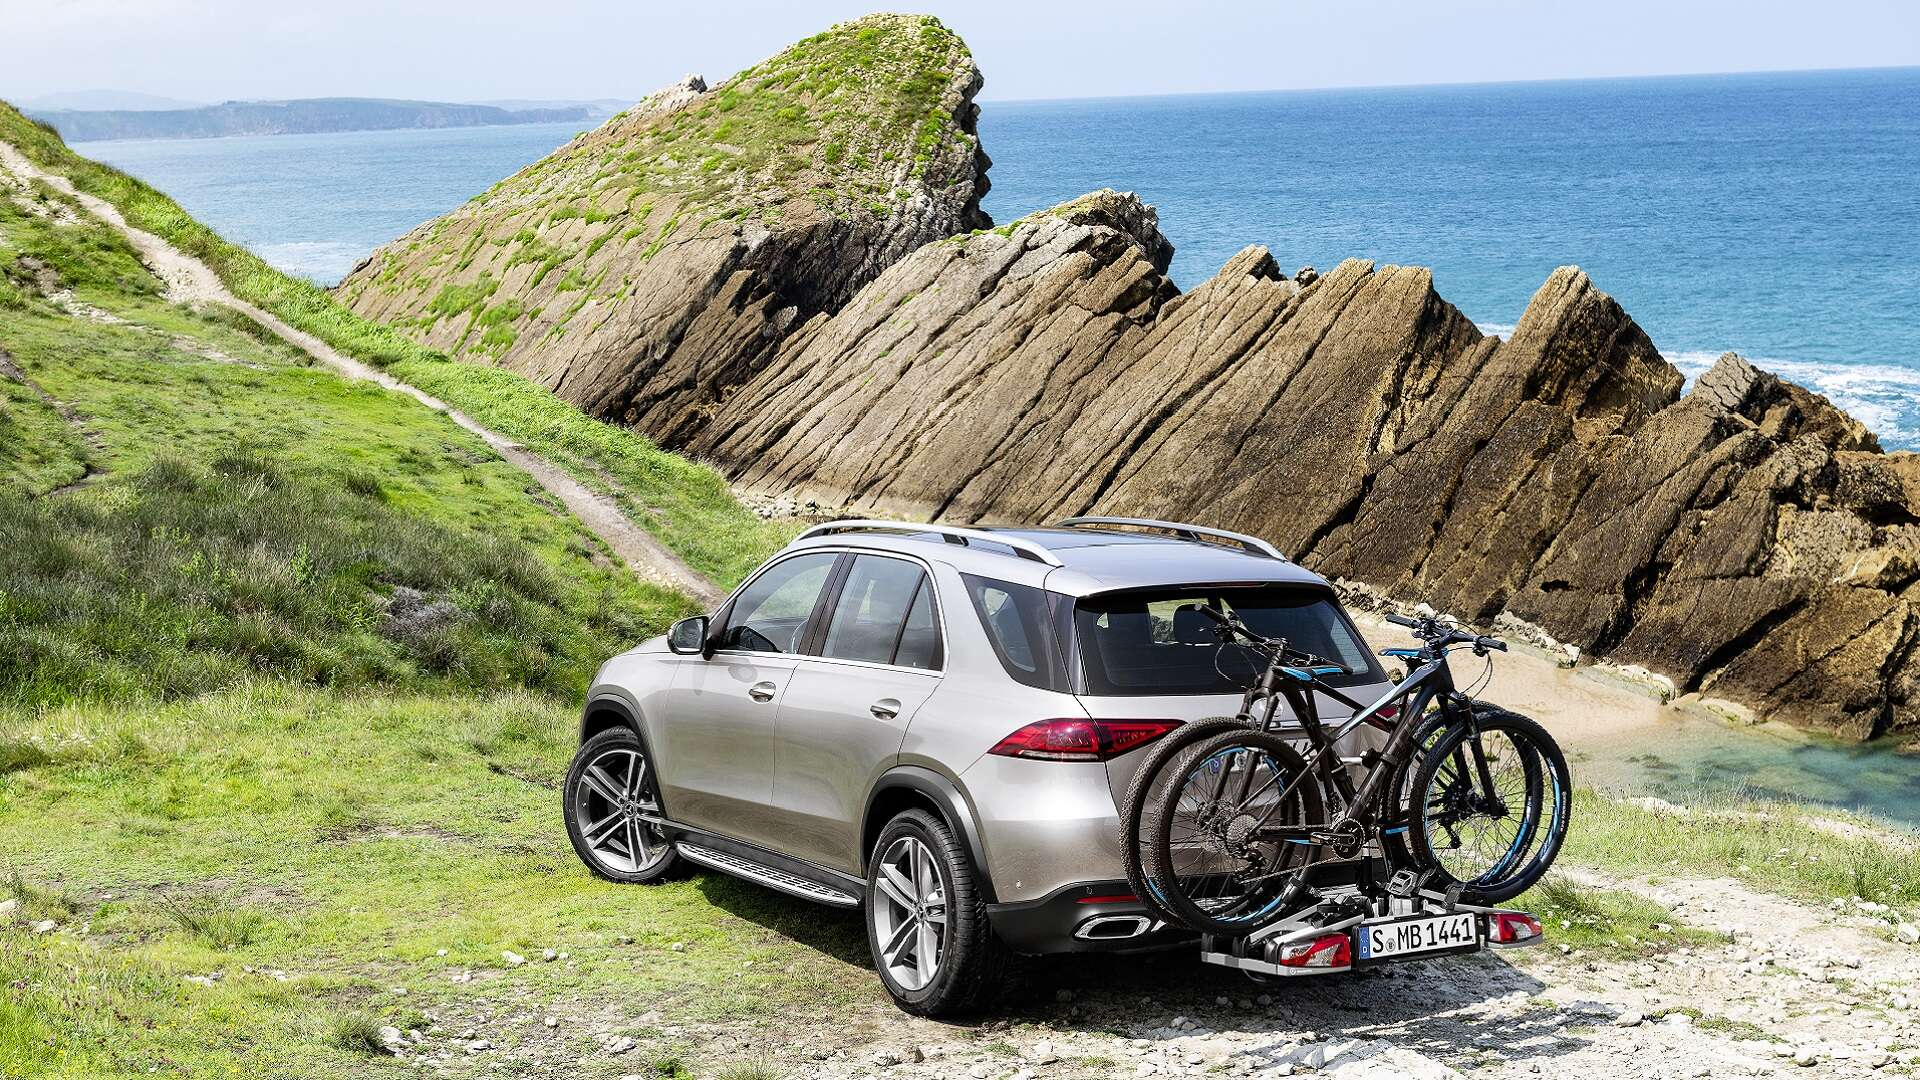 2020 Mercedes-Benz GLE Plug-In Hybrid Could Boast 62-Mile Range